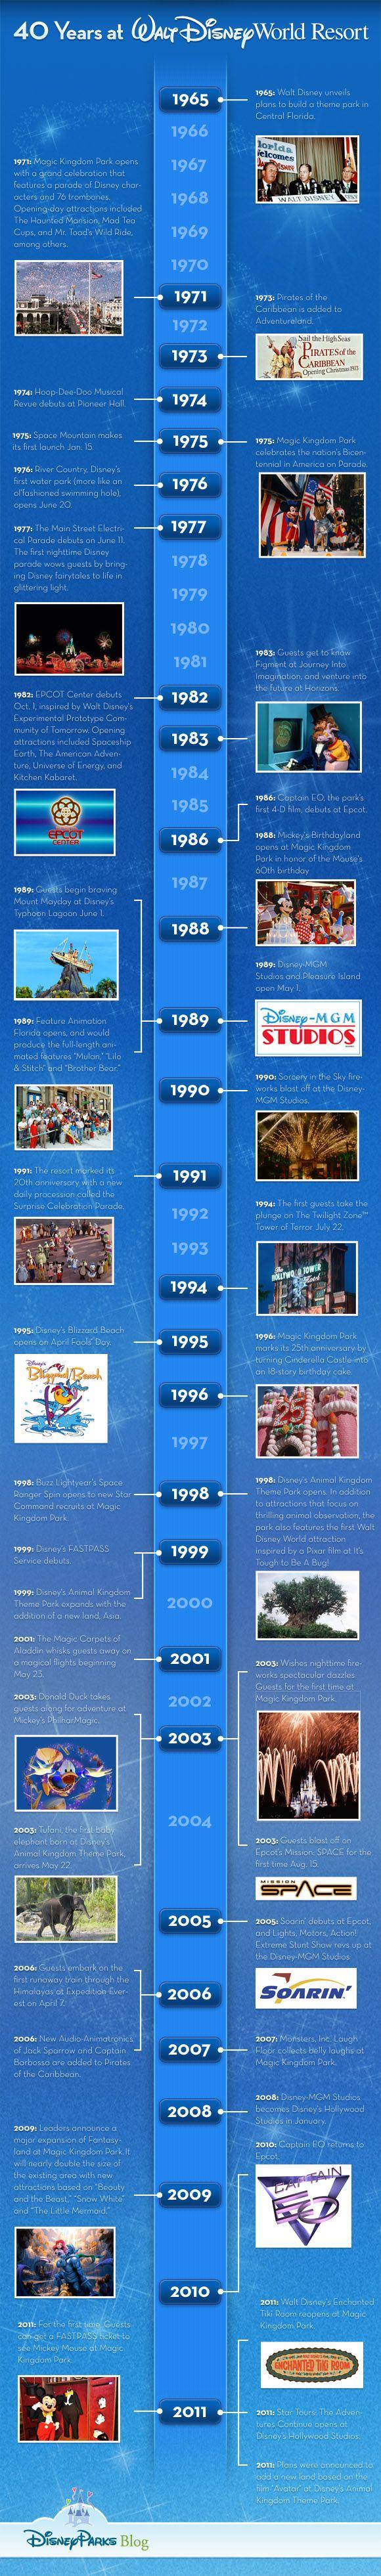 Timeline: Celebrating 40 Years at @Walt Disney World #Disney